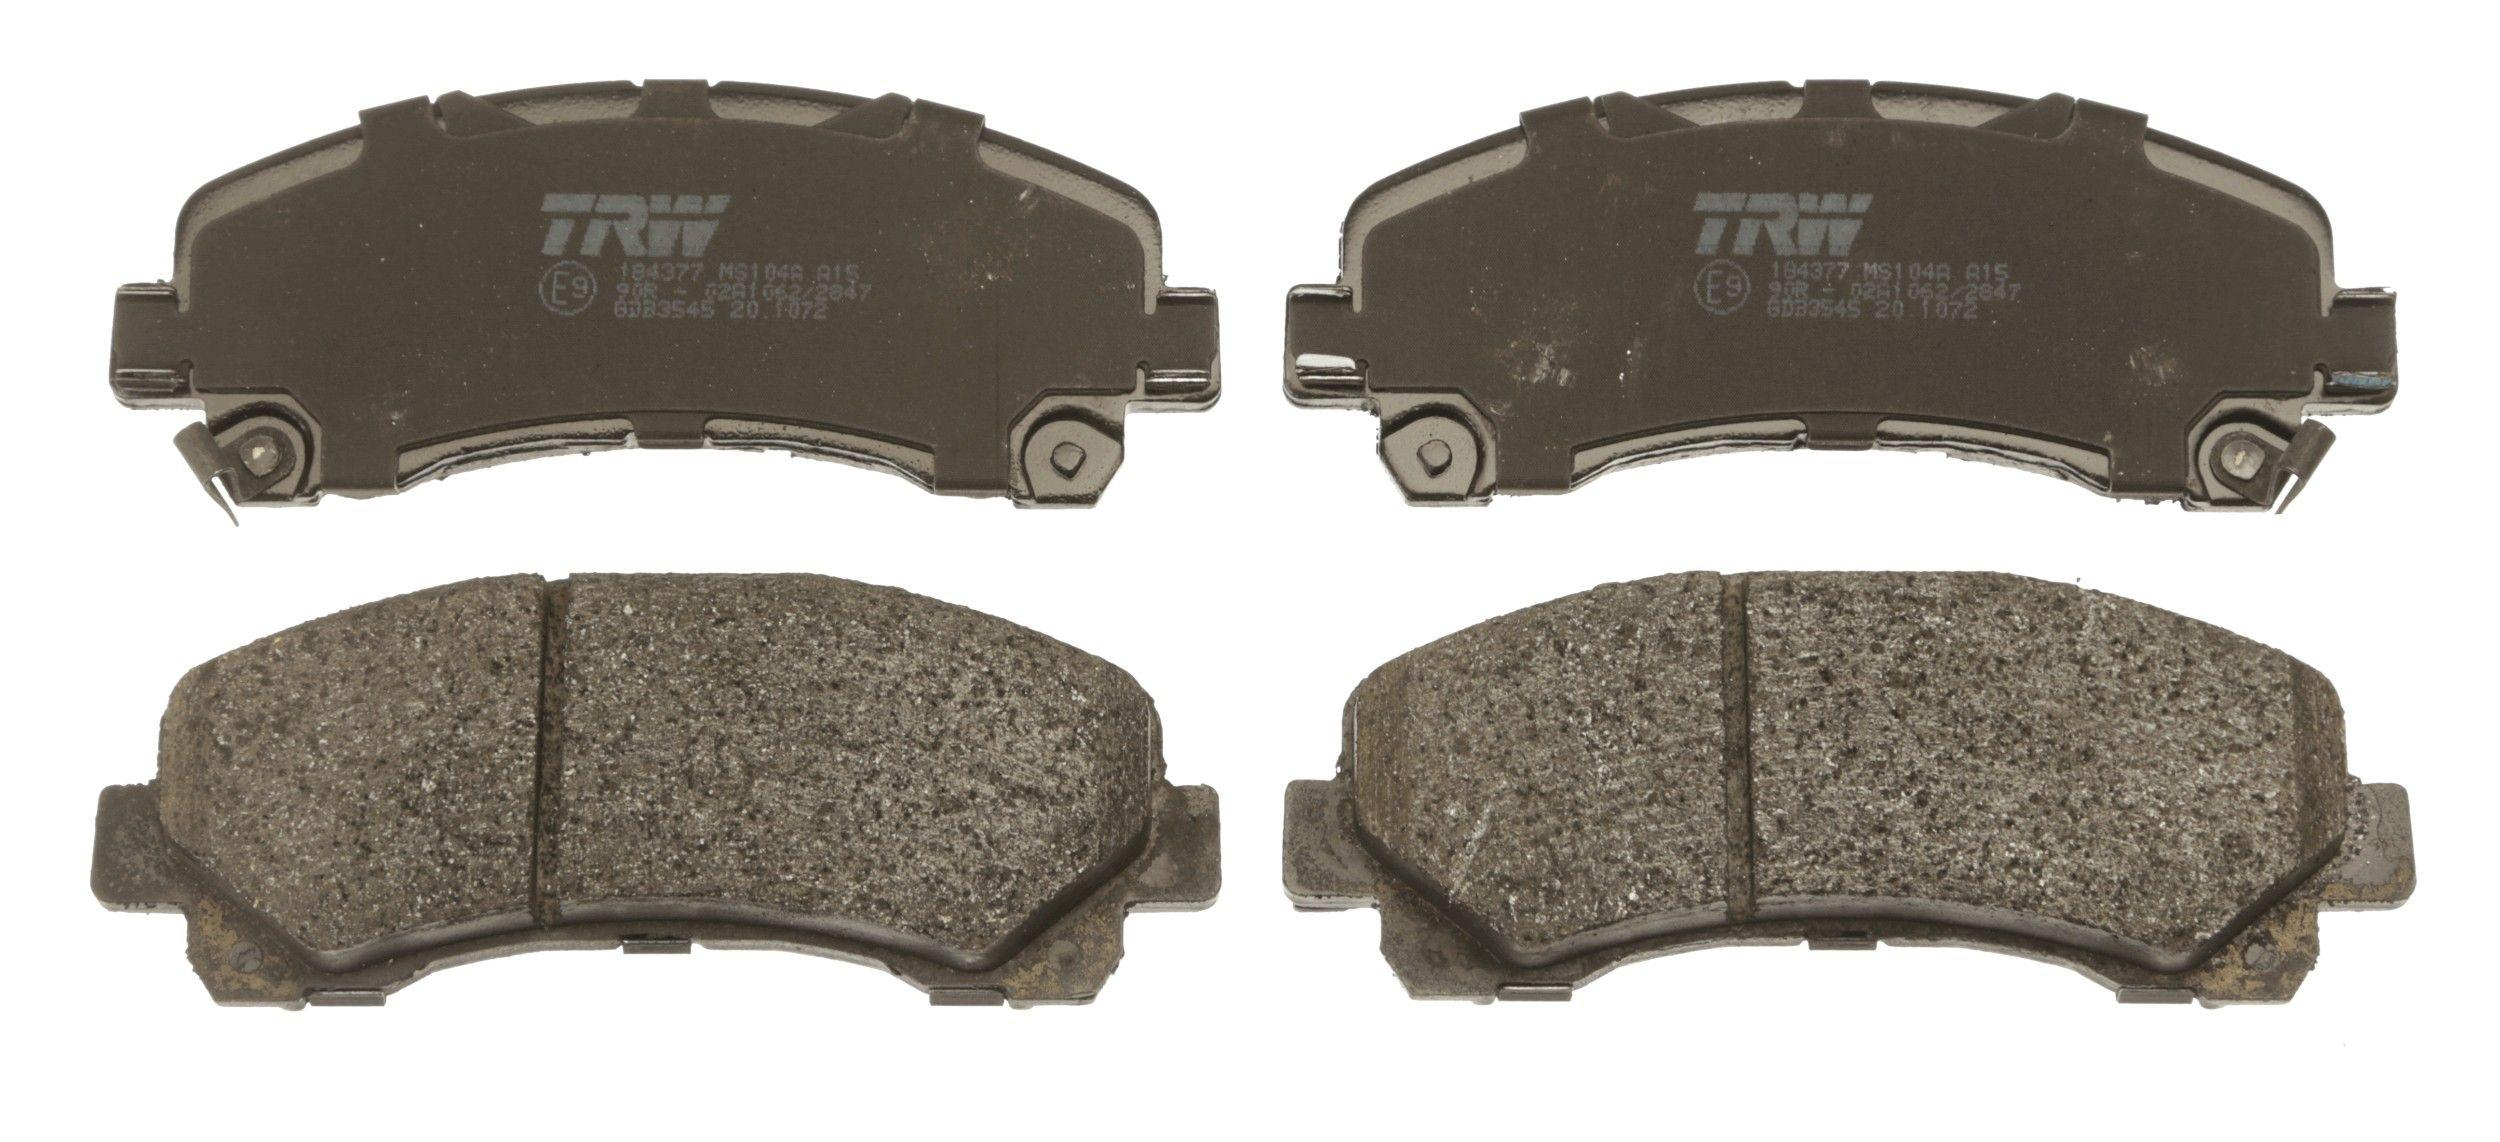 Bremsbelagsatz TRW 25150 Bewertung